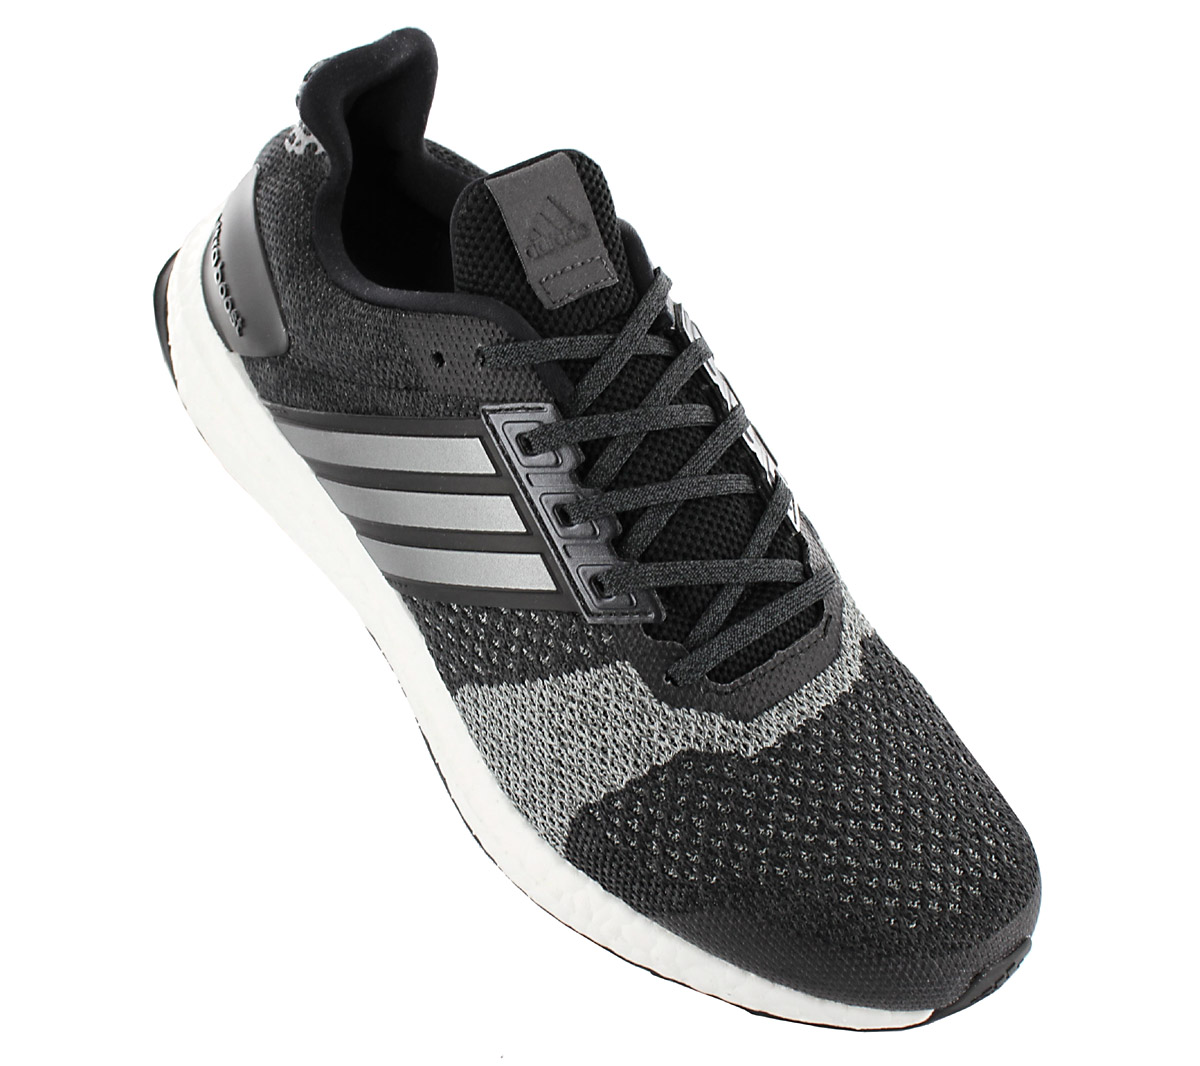 866c16e770342 Adidas Ultra Boost st Primeknit Men s Shoes Ultraboost Running Shoes ...